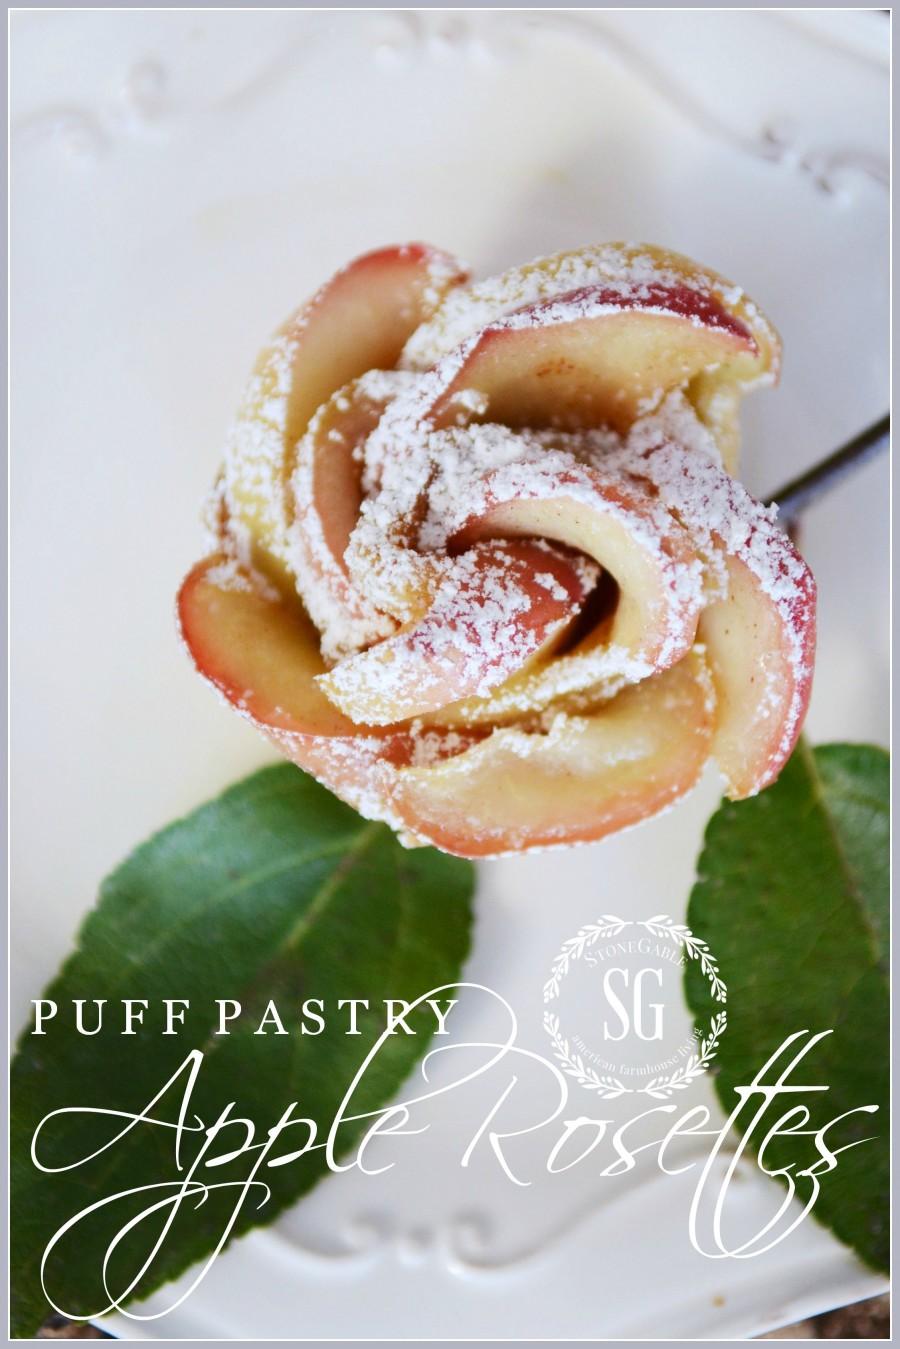 PUFF PASTRY APPLE ROSETTES- delicous, gorgeous and easy-peasy dessert-stonegableblog.com